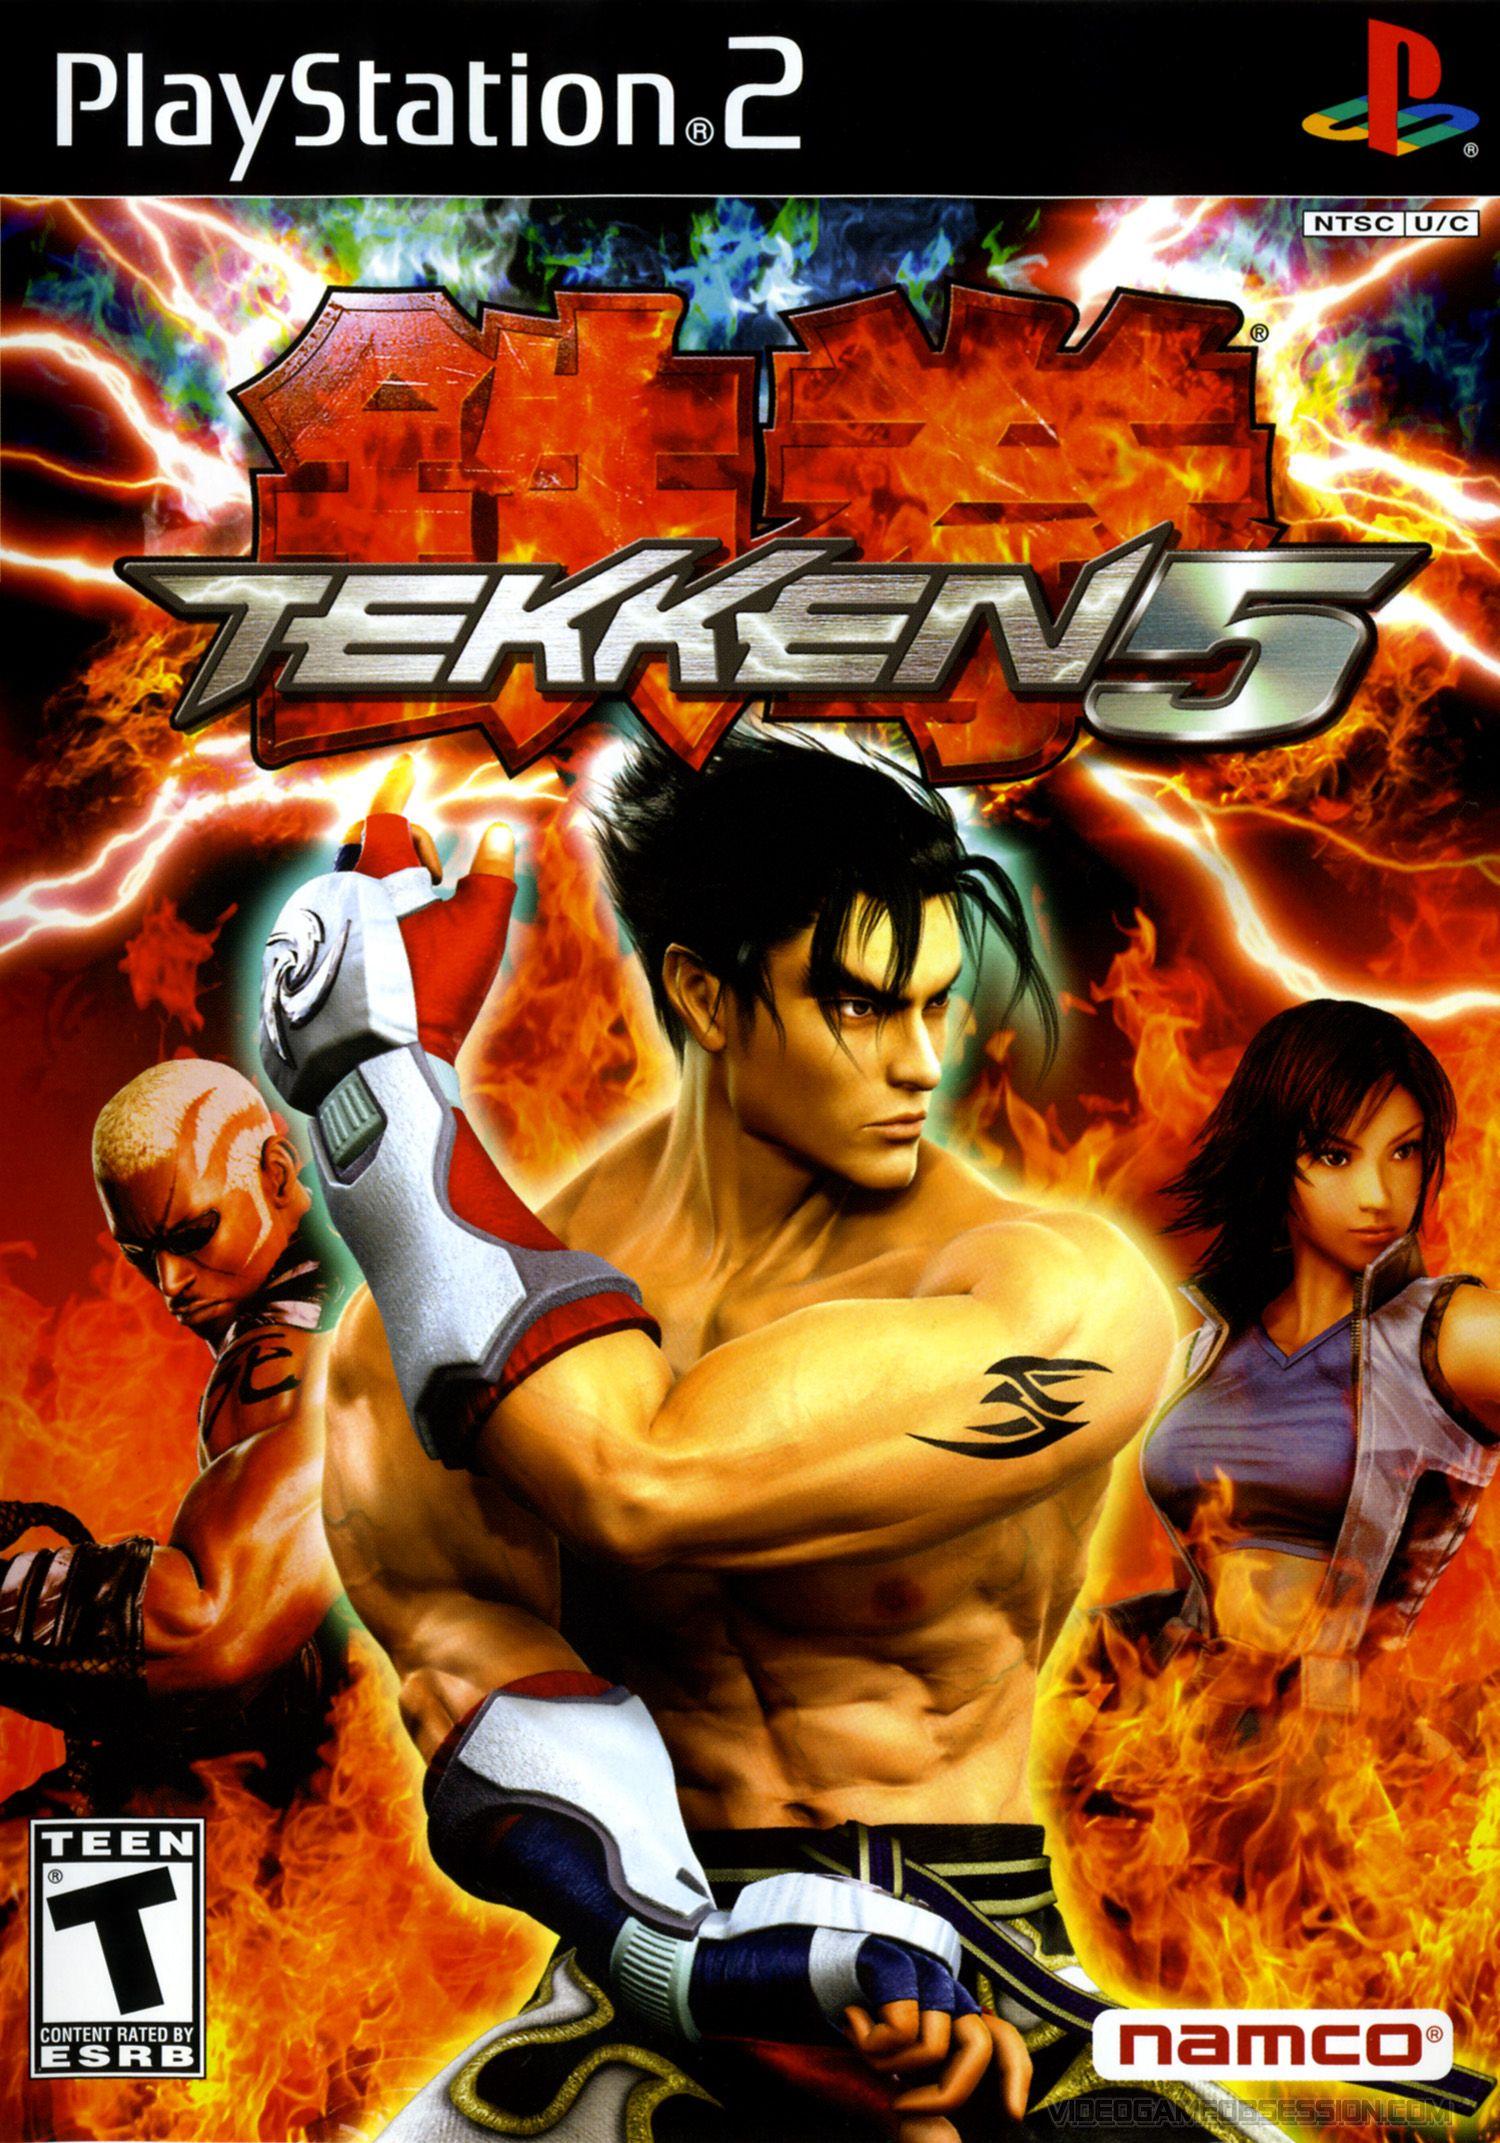 Tekken 5 Sony Playstation 2 Game Free pc games